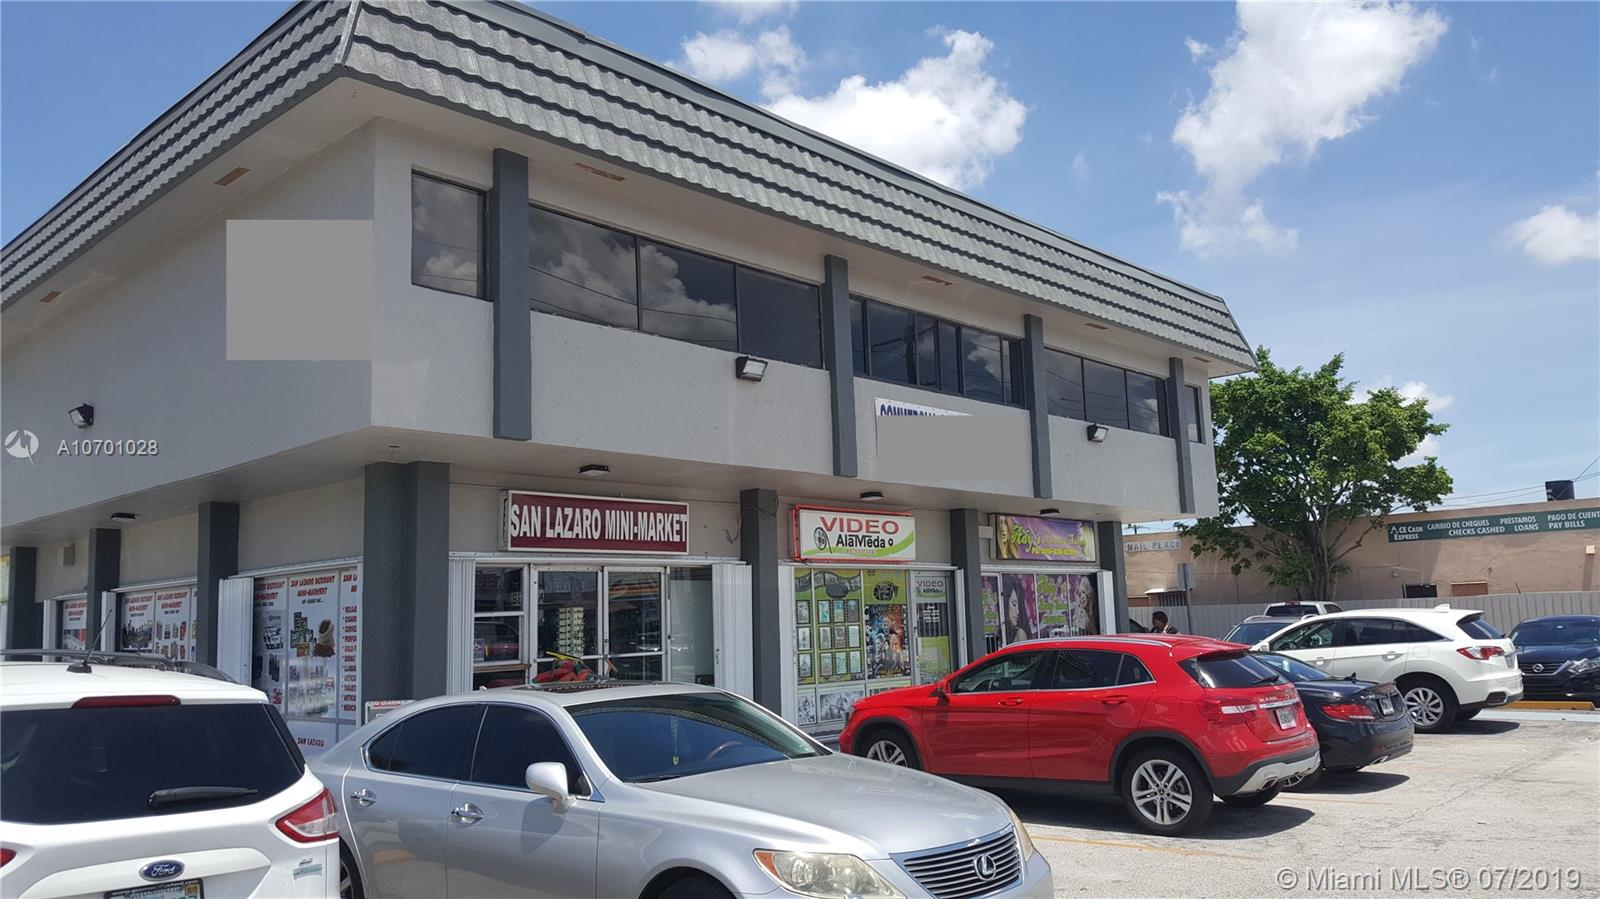 381 E 8th St # 206, Hialeah, Florida 33010, ,Commercial Sale,For Sale,381 E 8th St # 206,A10701028